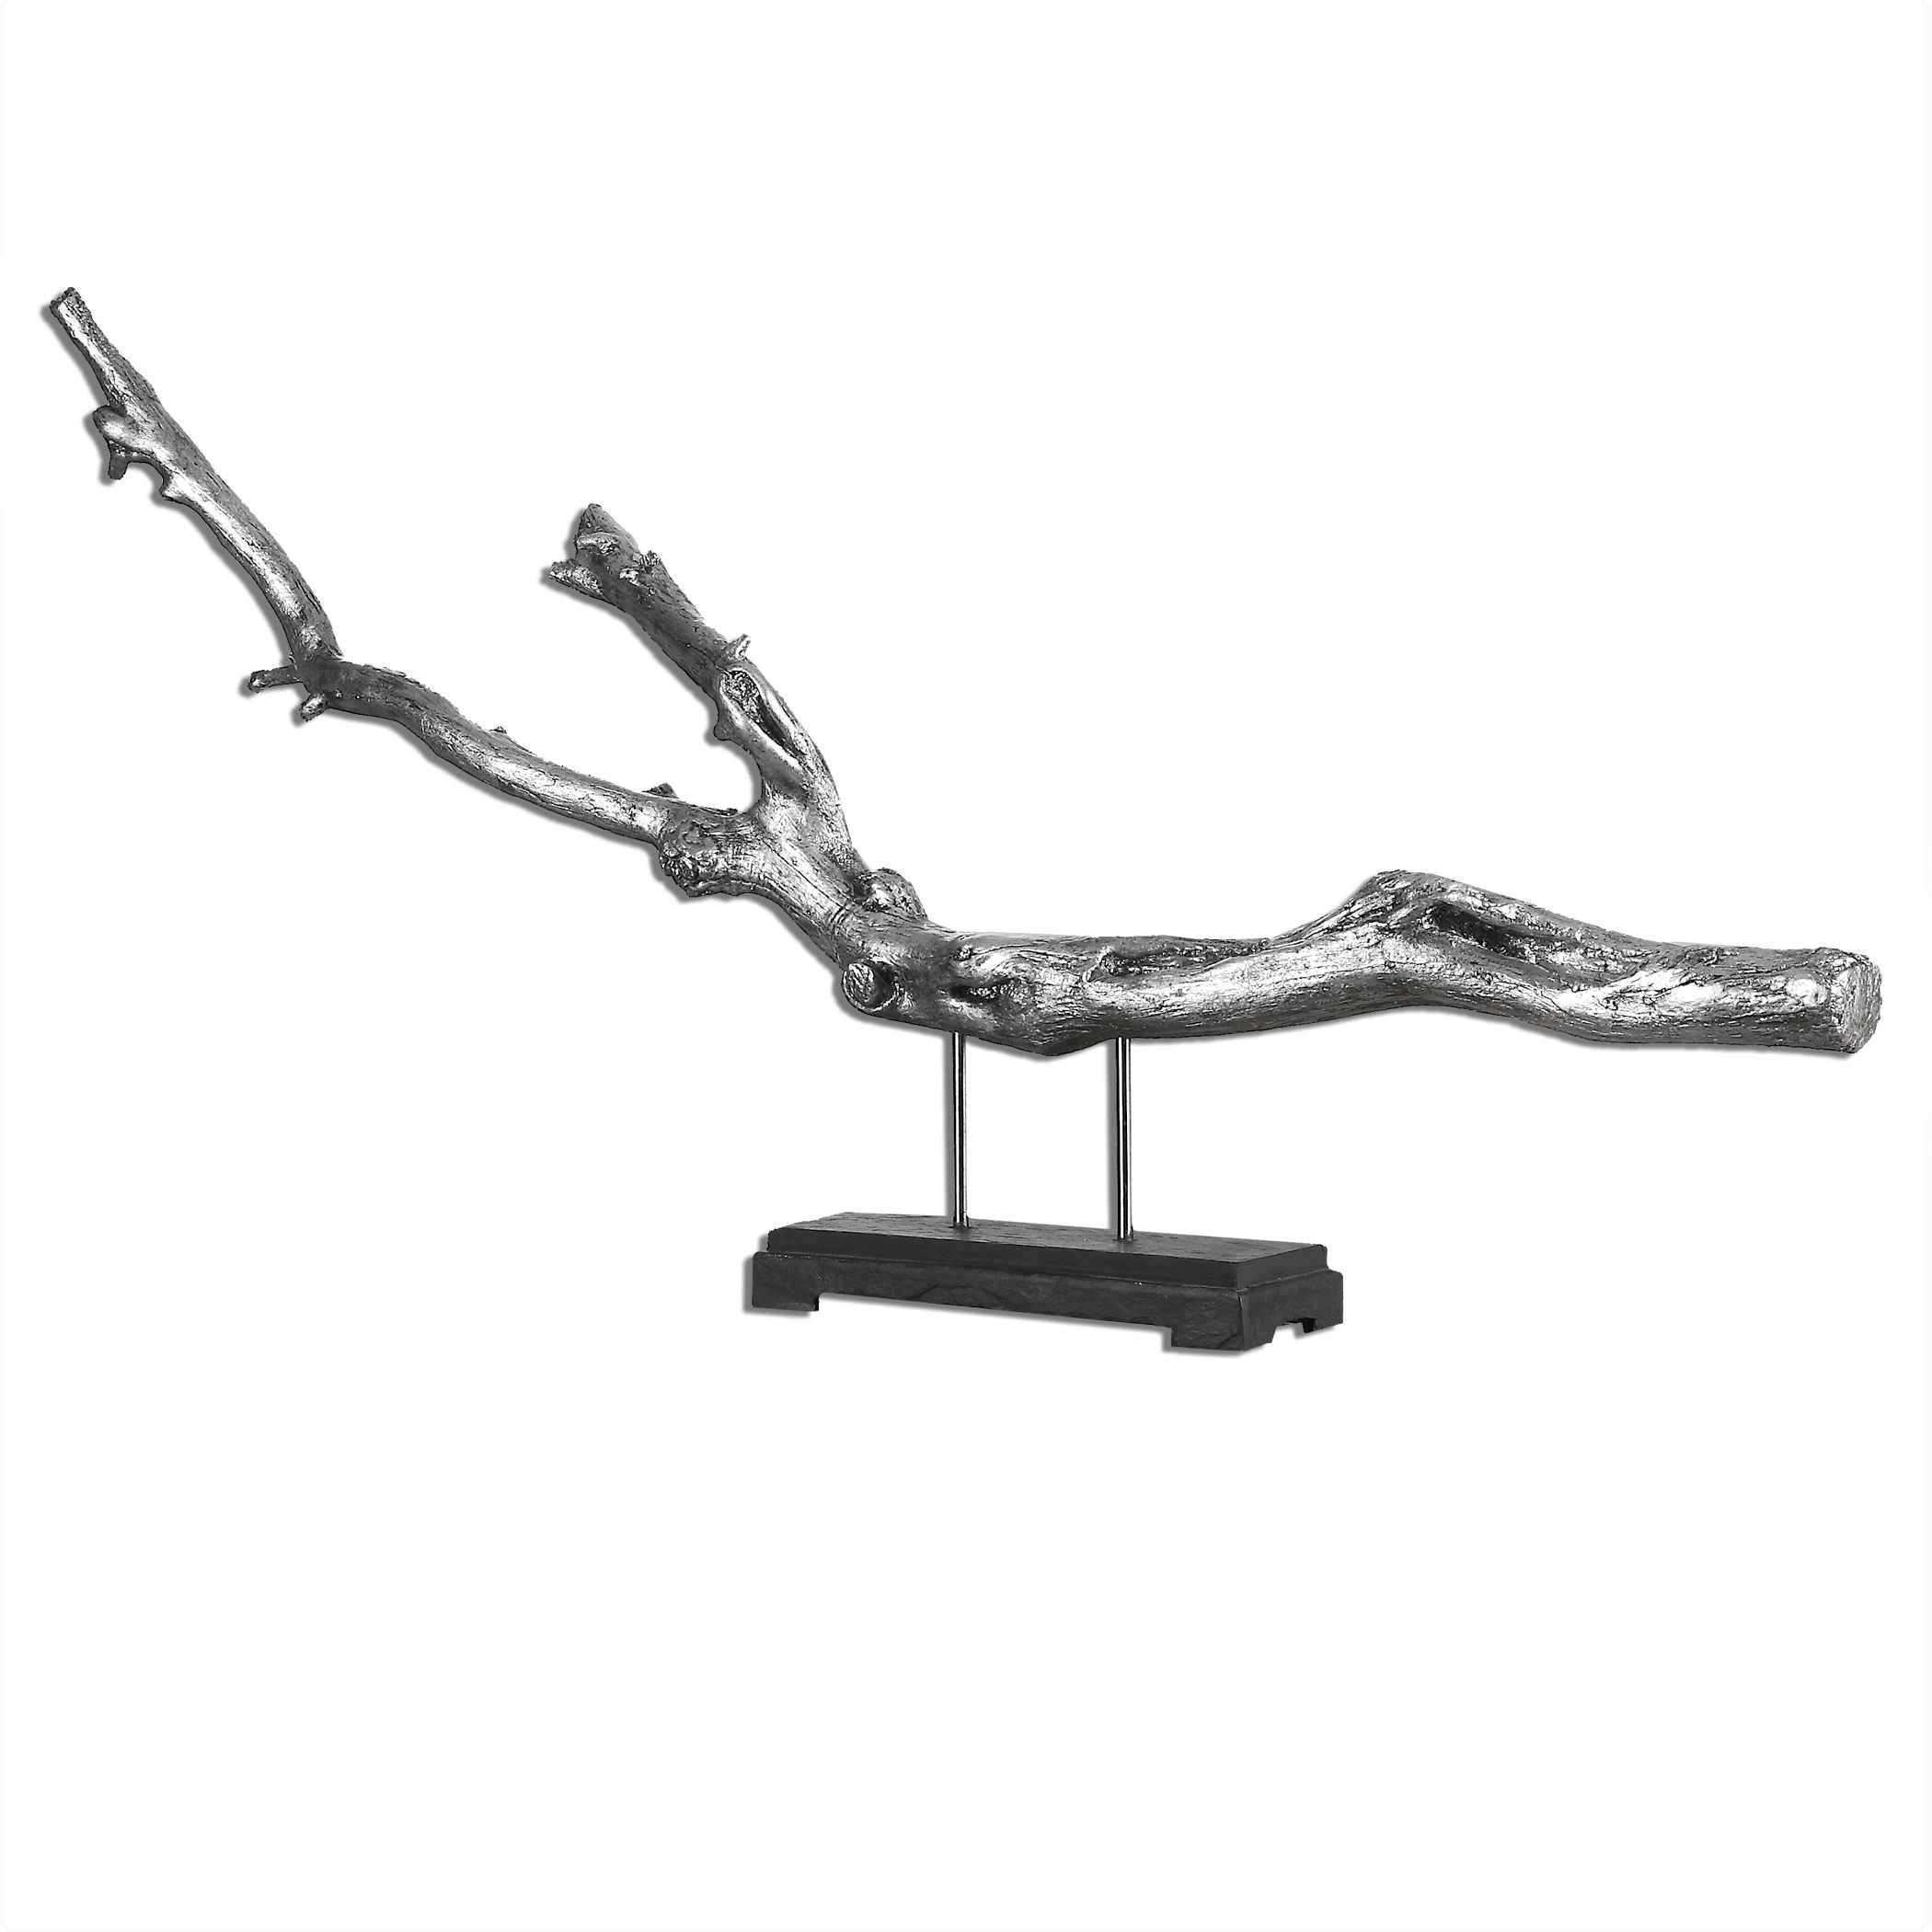 Becan Branch Sculpture